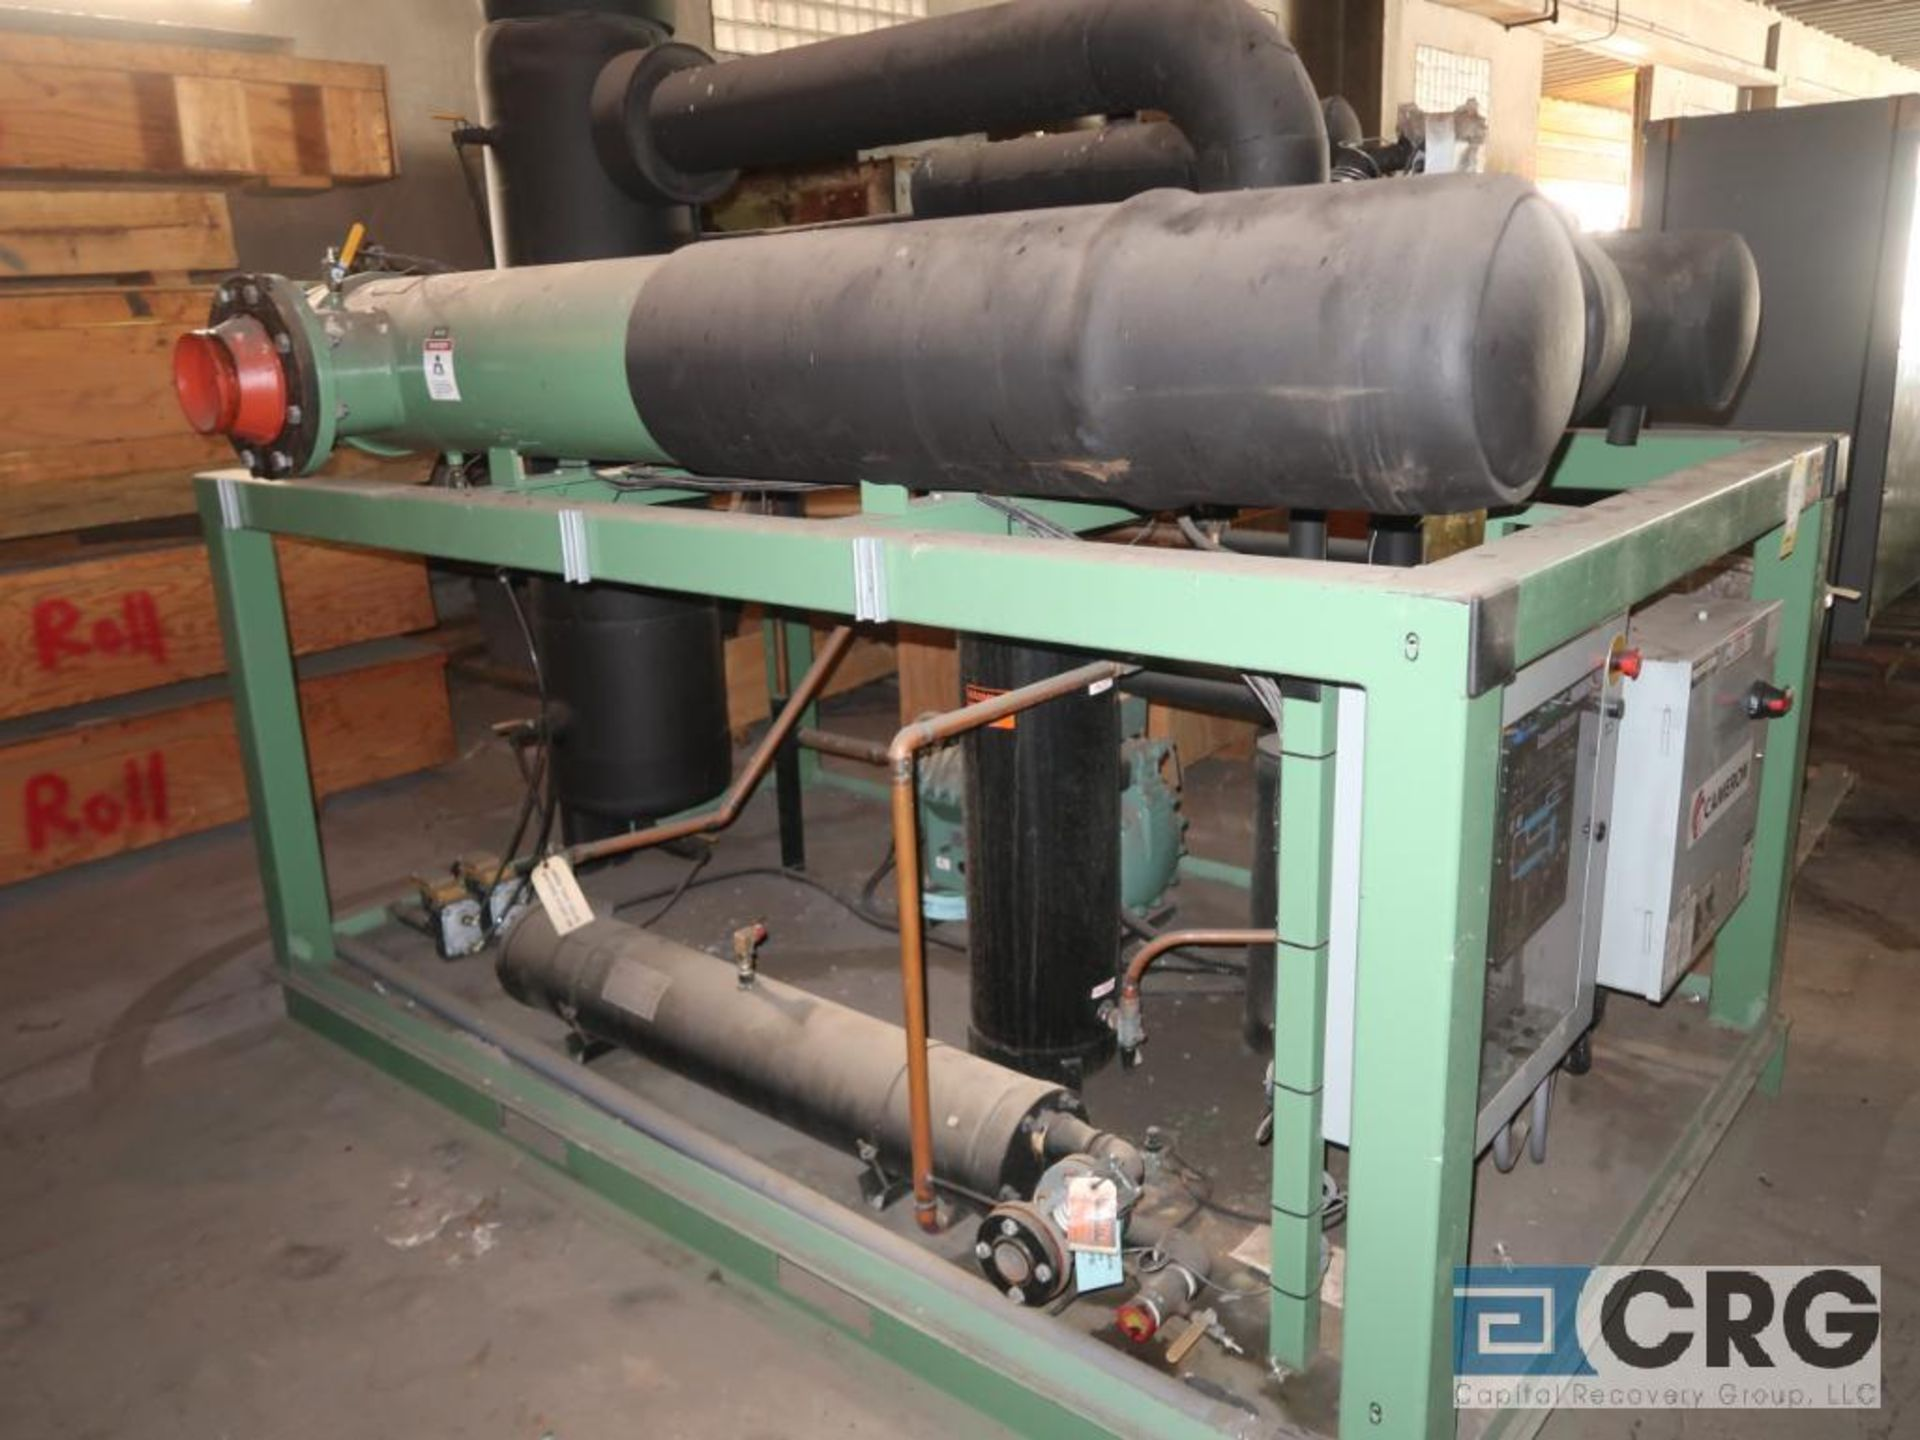 Cameron DC4000 W4 refrigeration/air dryer system, cap. 4,000 SCFM, MWP175, 460 volt (Off Site - Image 3 of 4